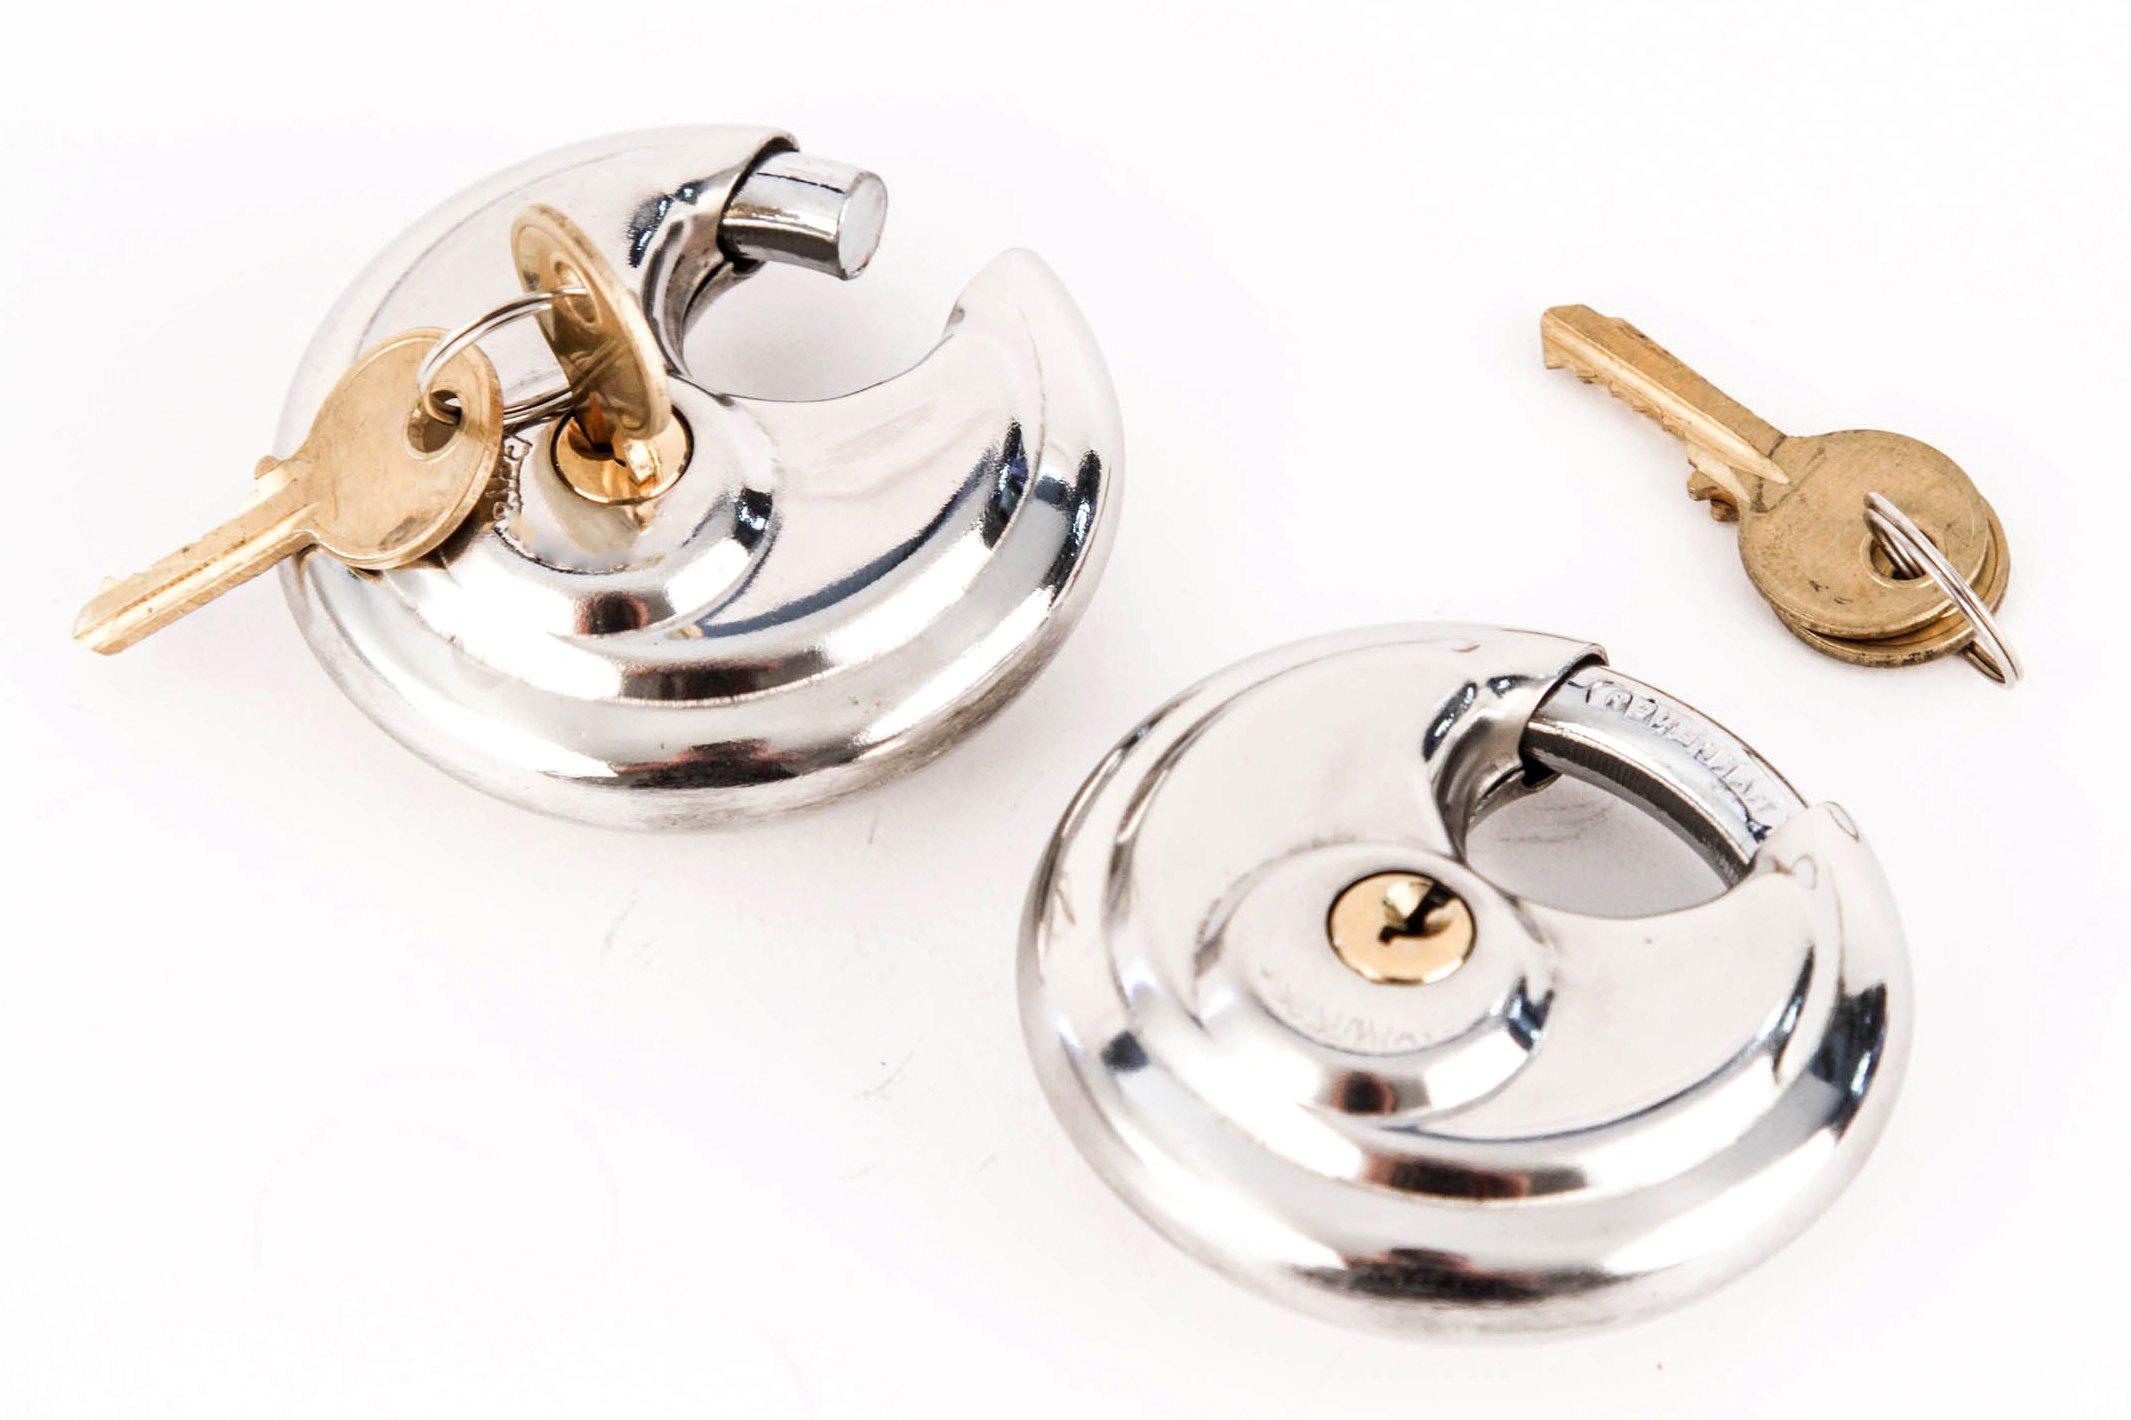 Red Hound Auto 6 Armor Disc Padlock Trailer Brass Cylinder Storage Locks Stainless Keyed Same by Red Hound Auto (Image #4)